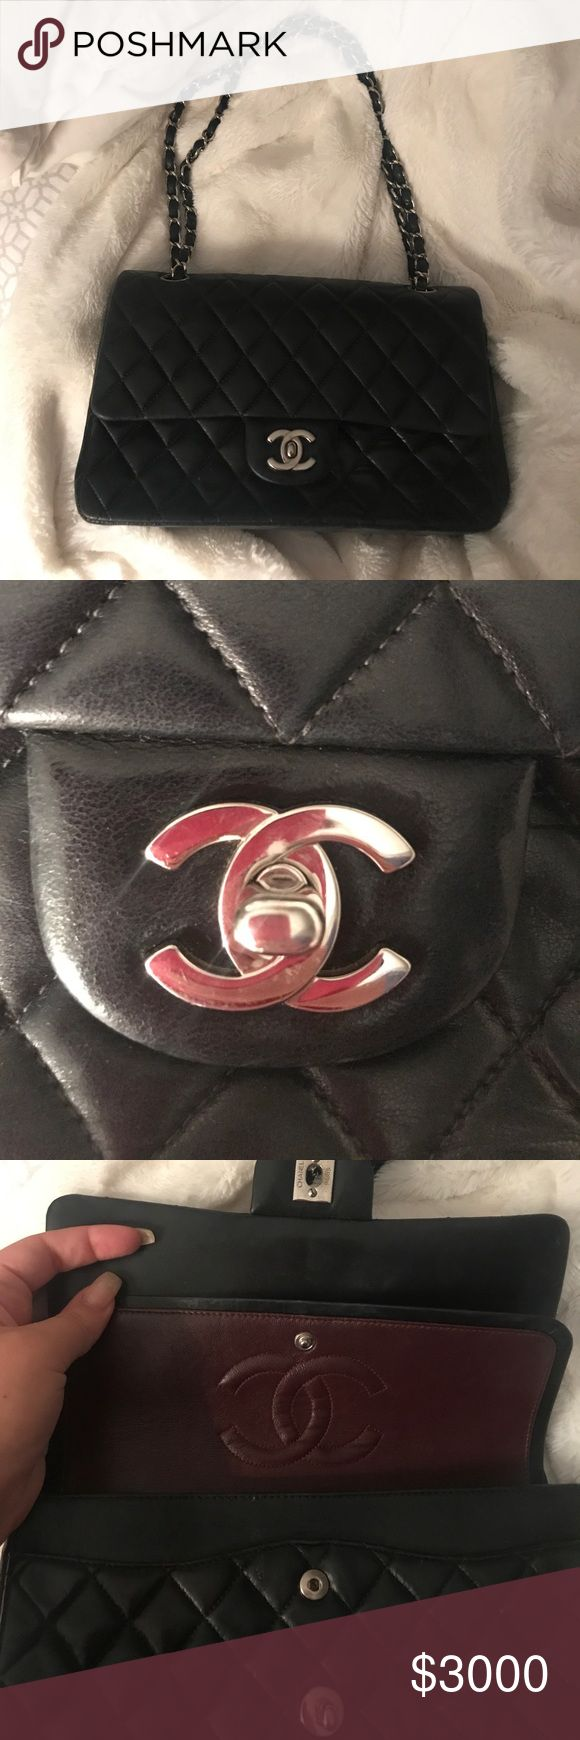 CHANEL DOUBLE FLAP BAG W SILVERHARDWARE Authentic Chanel Double Flap bag with silver hardware! CHANEL Bags Shoulder Bags